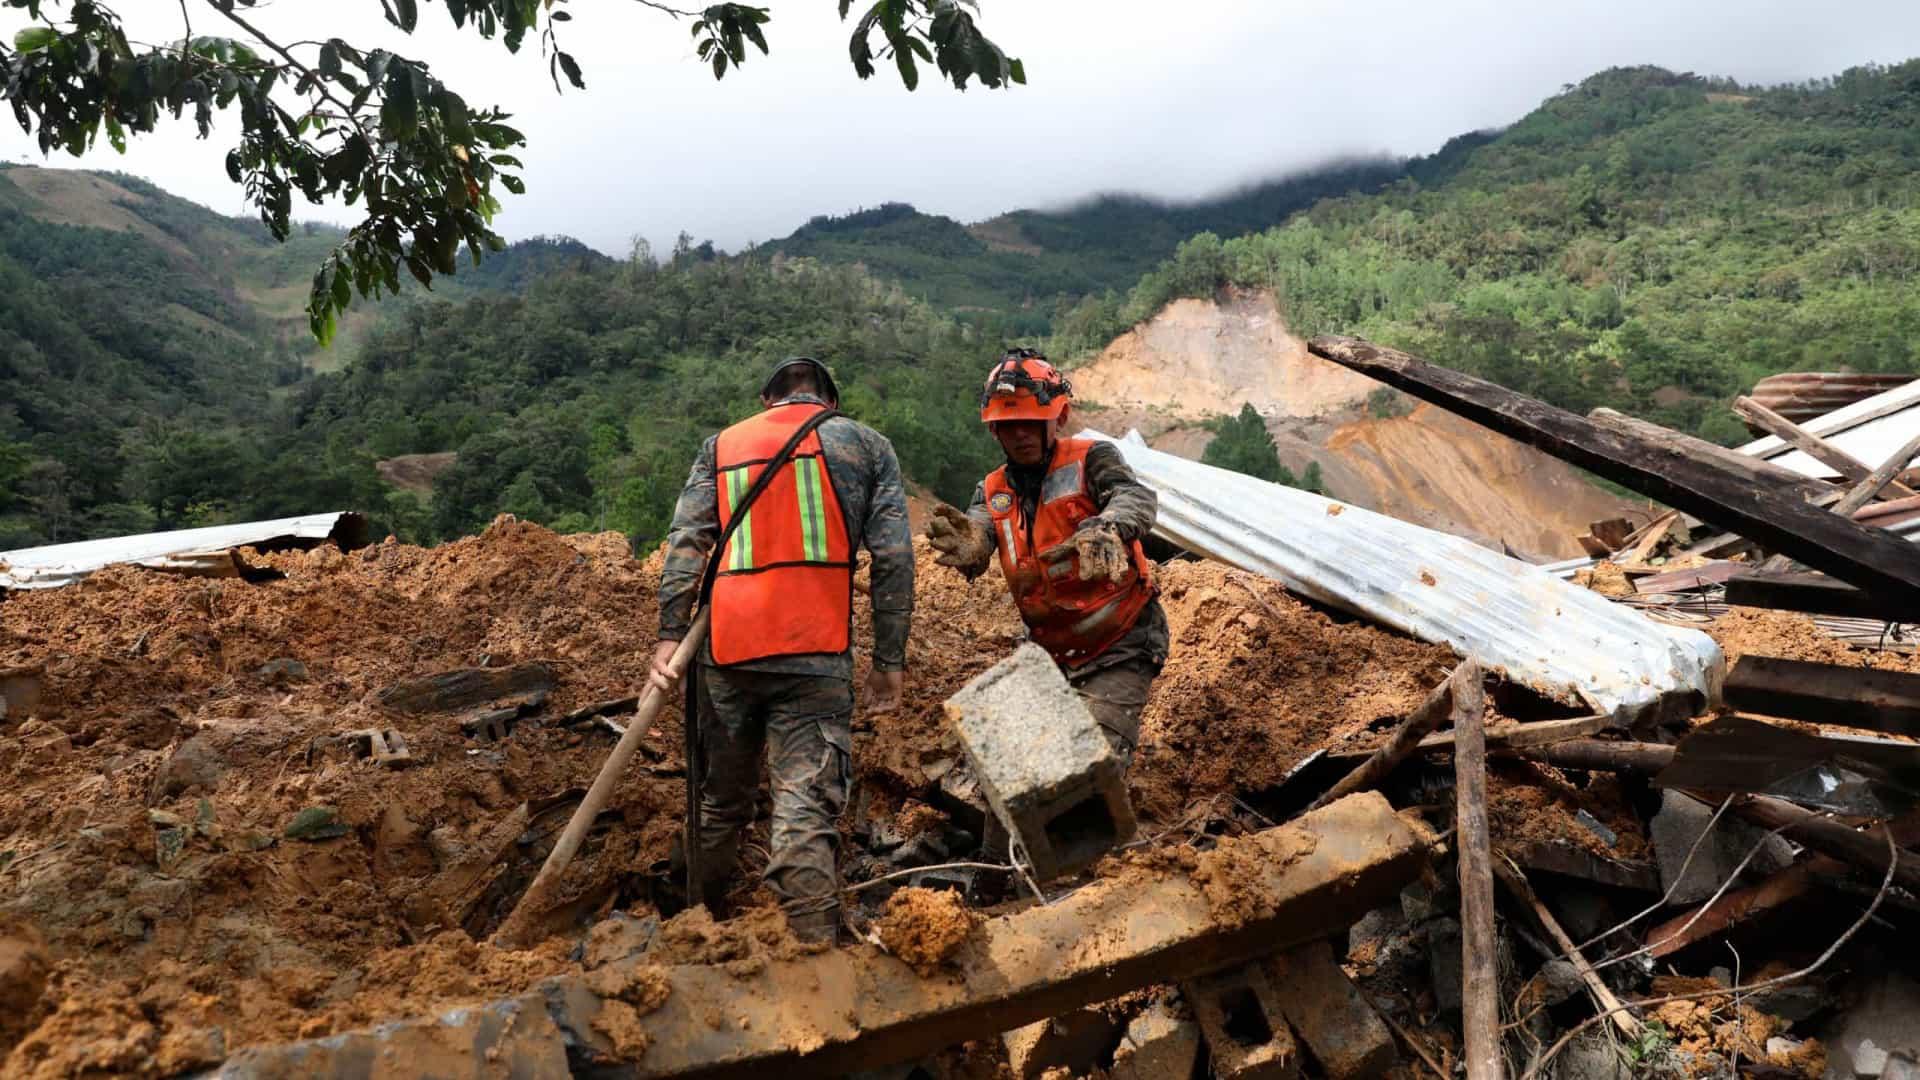 guatemala - Mulher perde 22 familiares após deslizamento de terras em aldeia na Guatemala